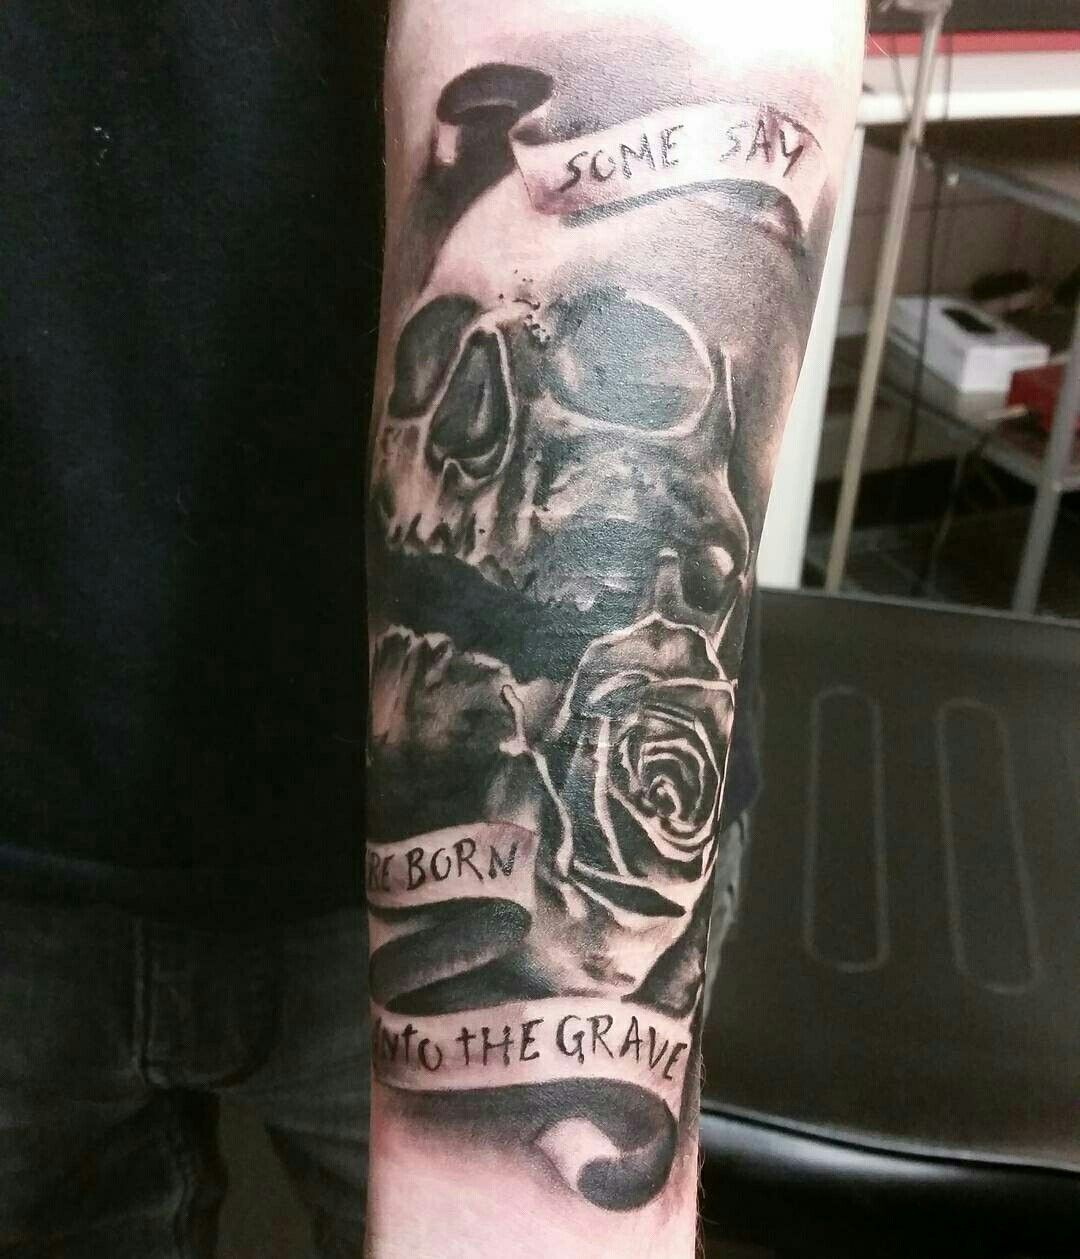 Gallery images and information soundgarden badmotorfinger tattoo - Them Bones